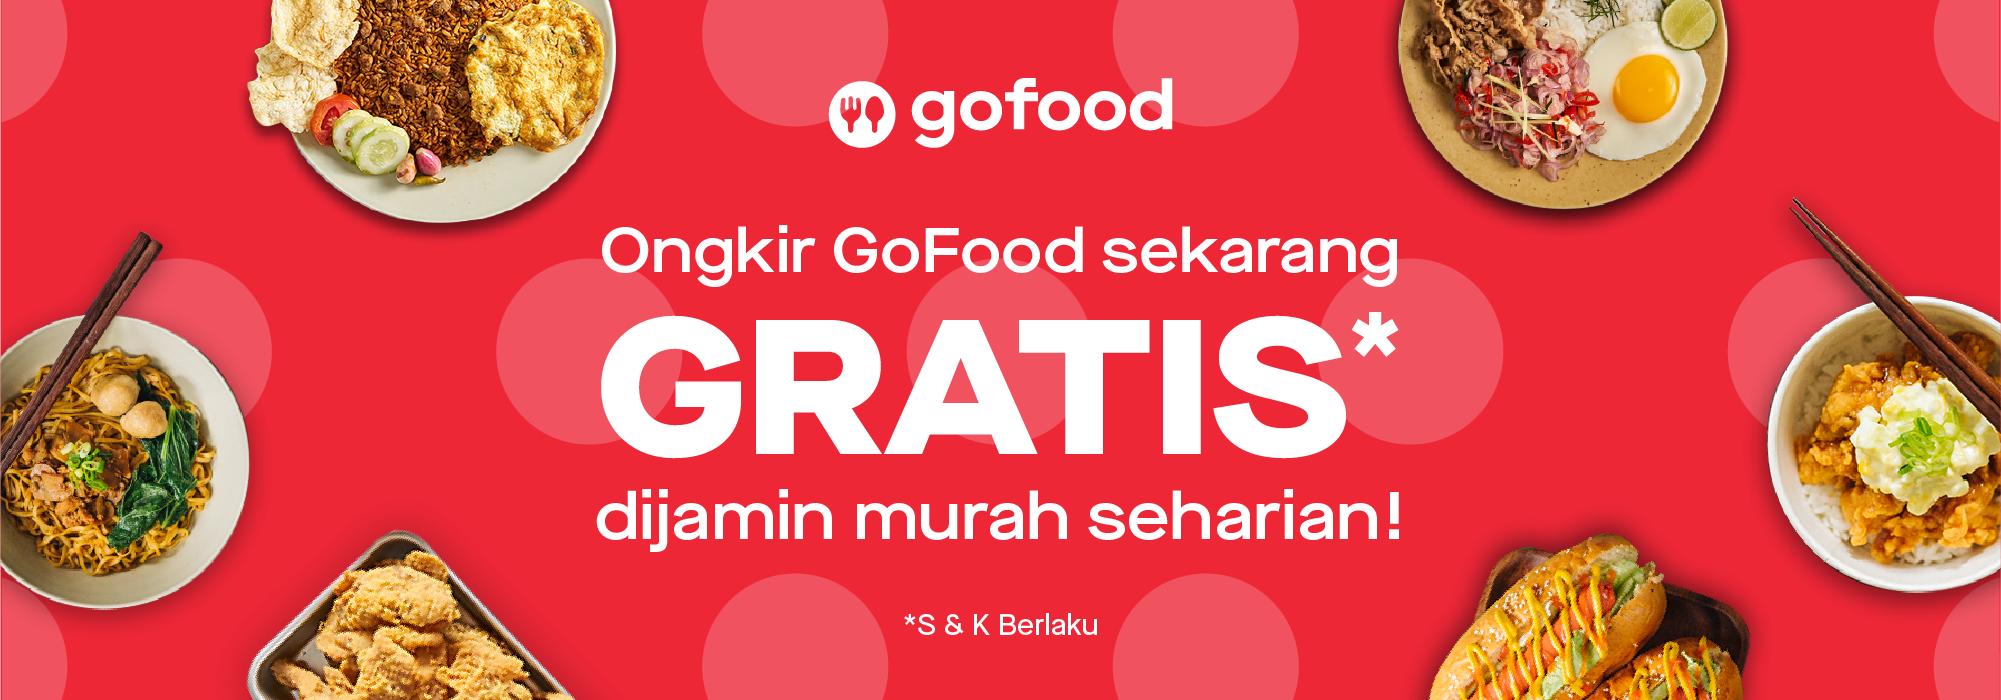 Promo GoFood Agustus 2019: Diskon Hingga 25% & Gratis